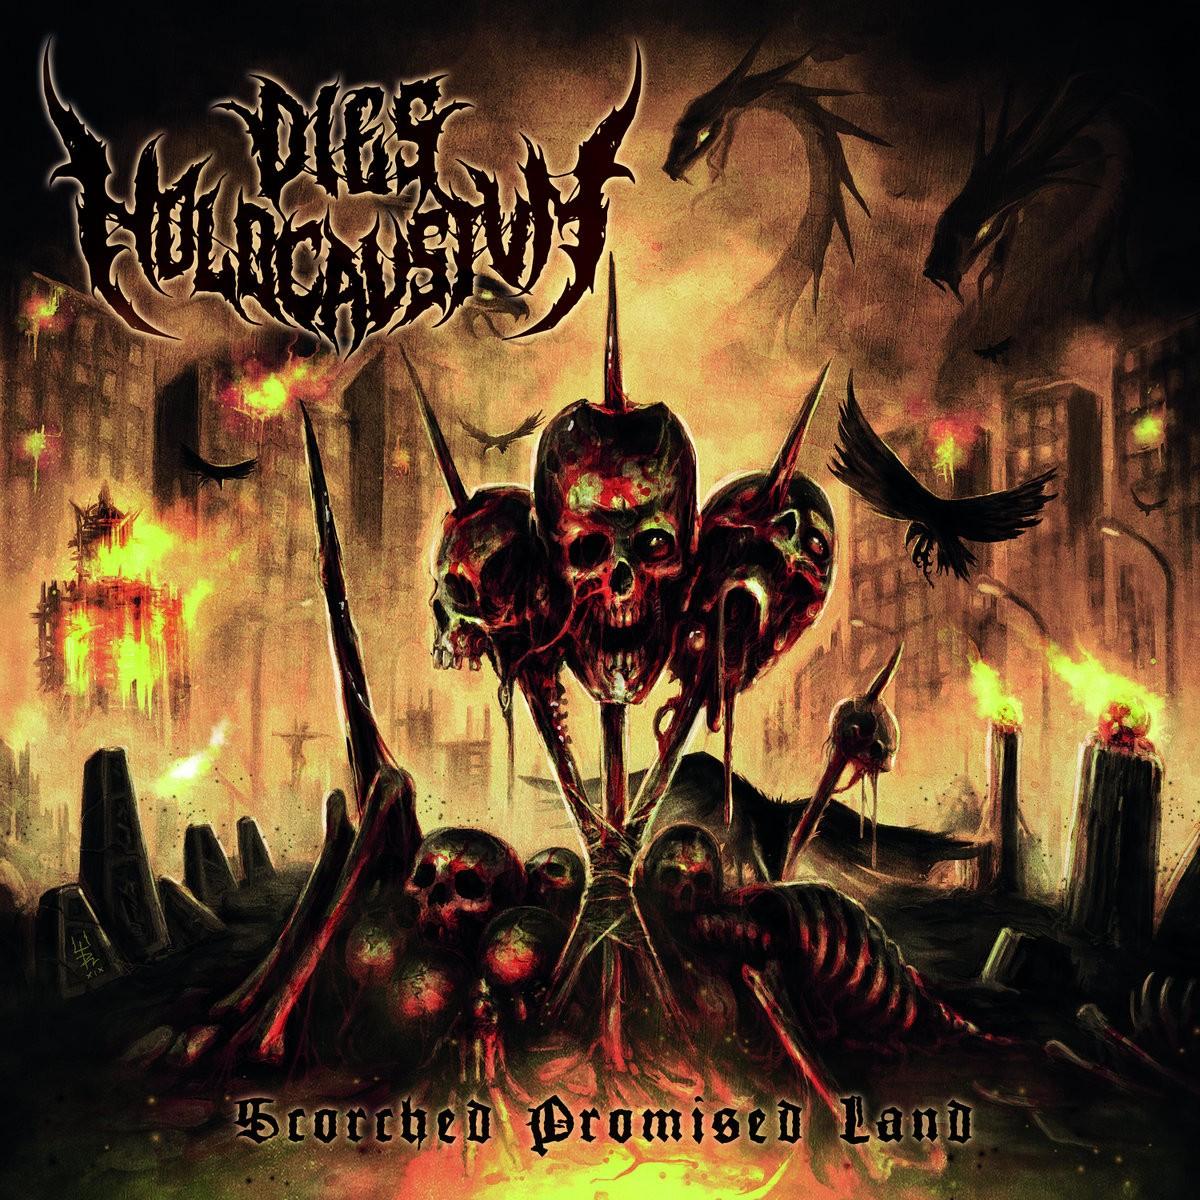 skulls on the CD cover